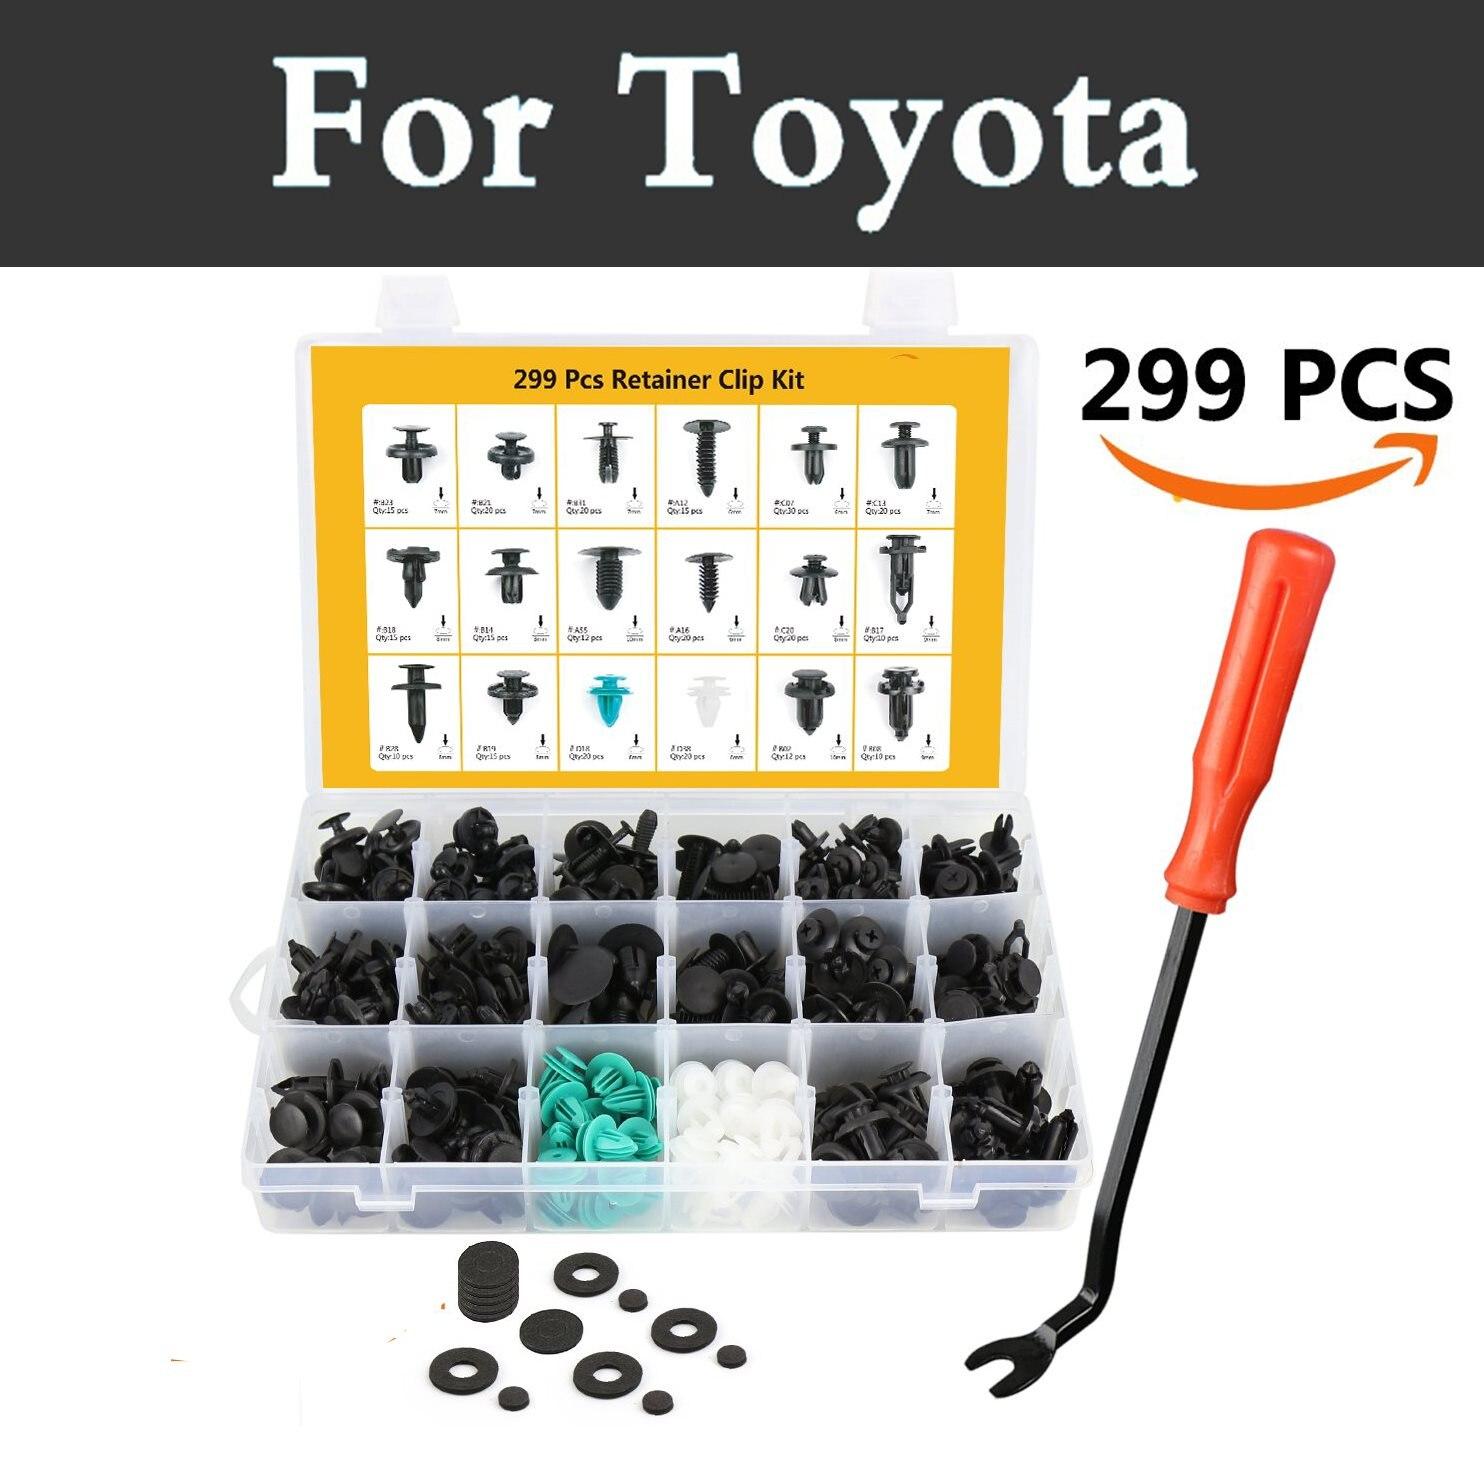 299pcs Car Plastic Fasteners Rivets Push Pin Fasteners Tool Rivets For Toyota Hilux Surf Iq Ist Kluger Land Cruiser Prado